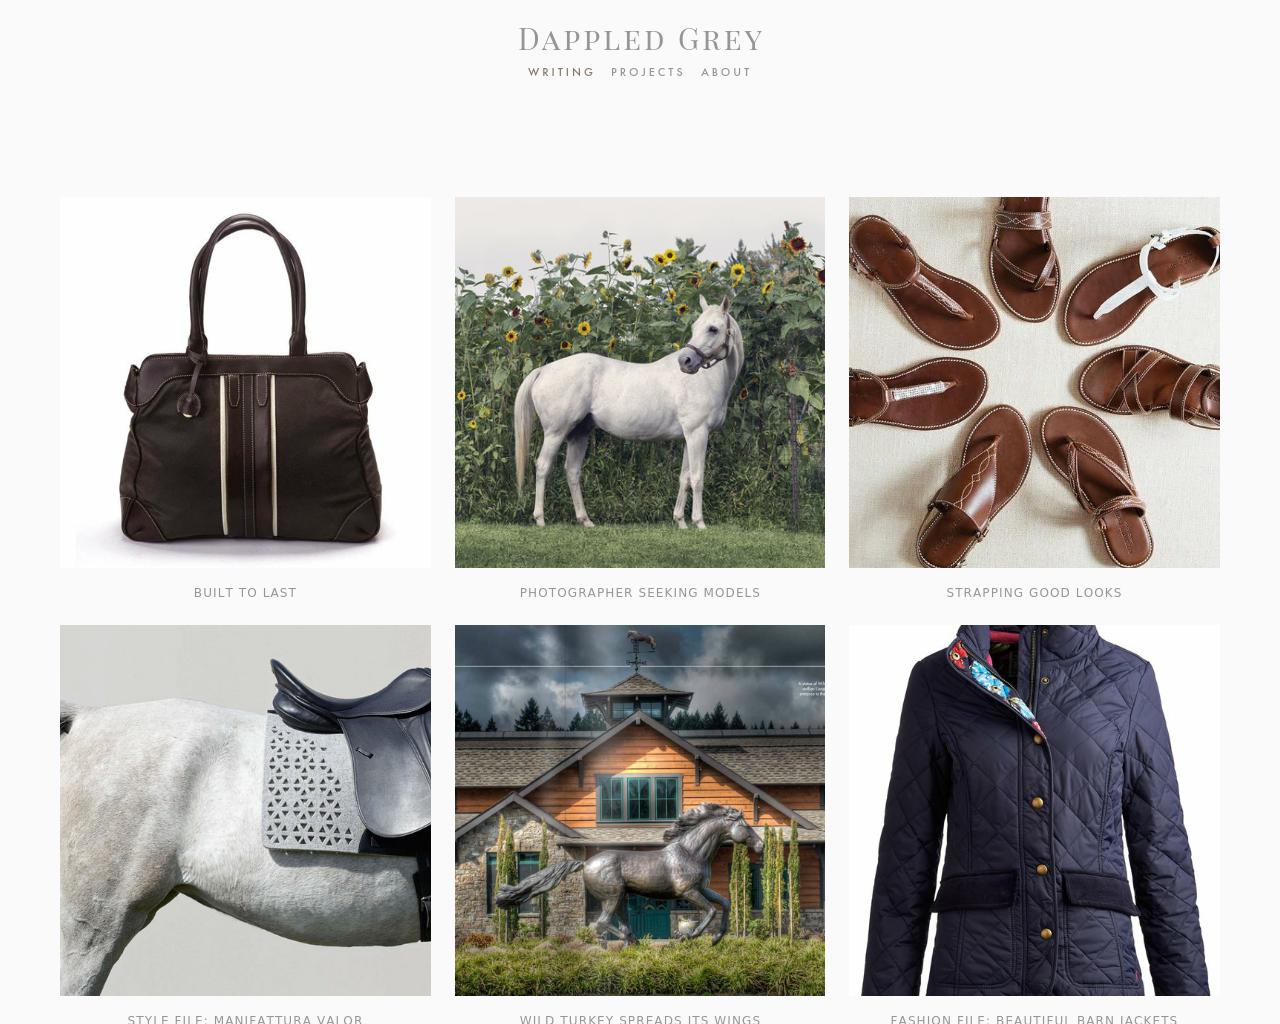 Dappled-Grey-Advertising-Reviews-Pricing